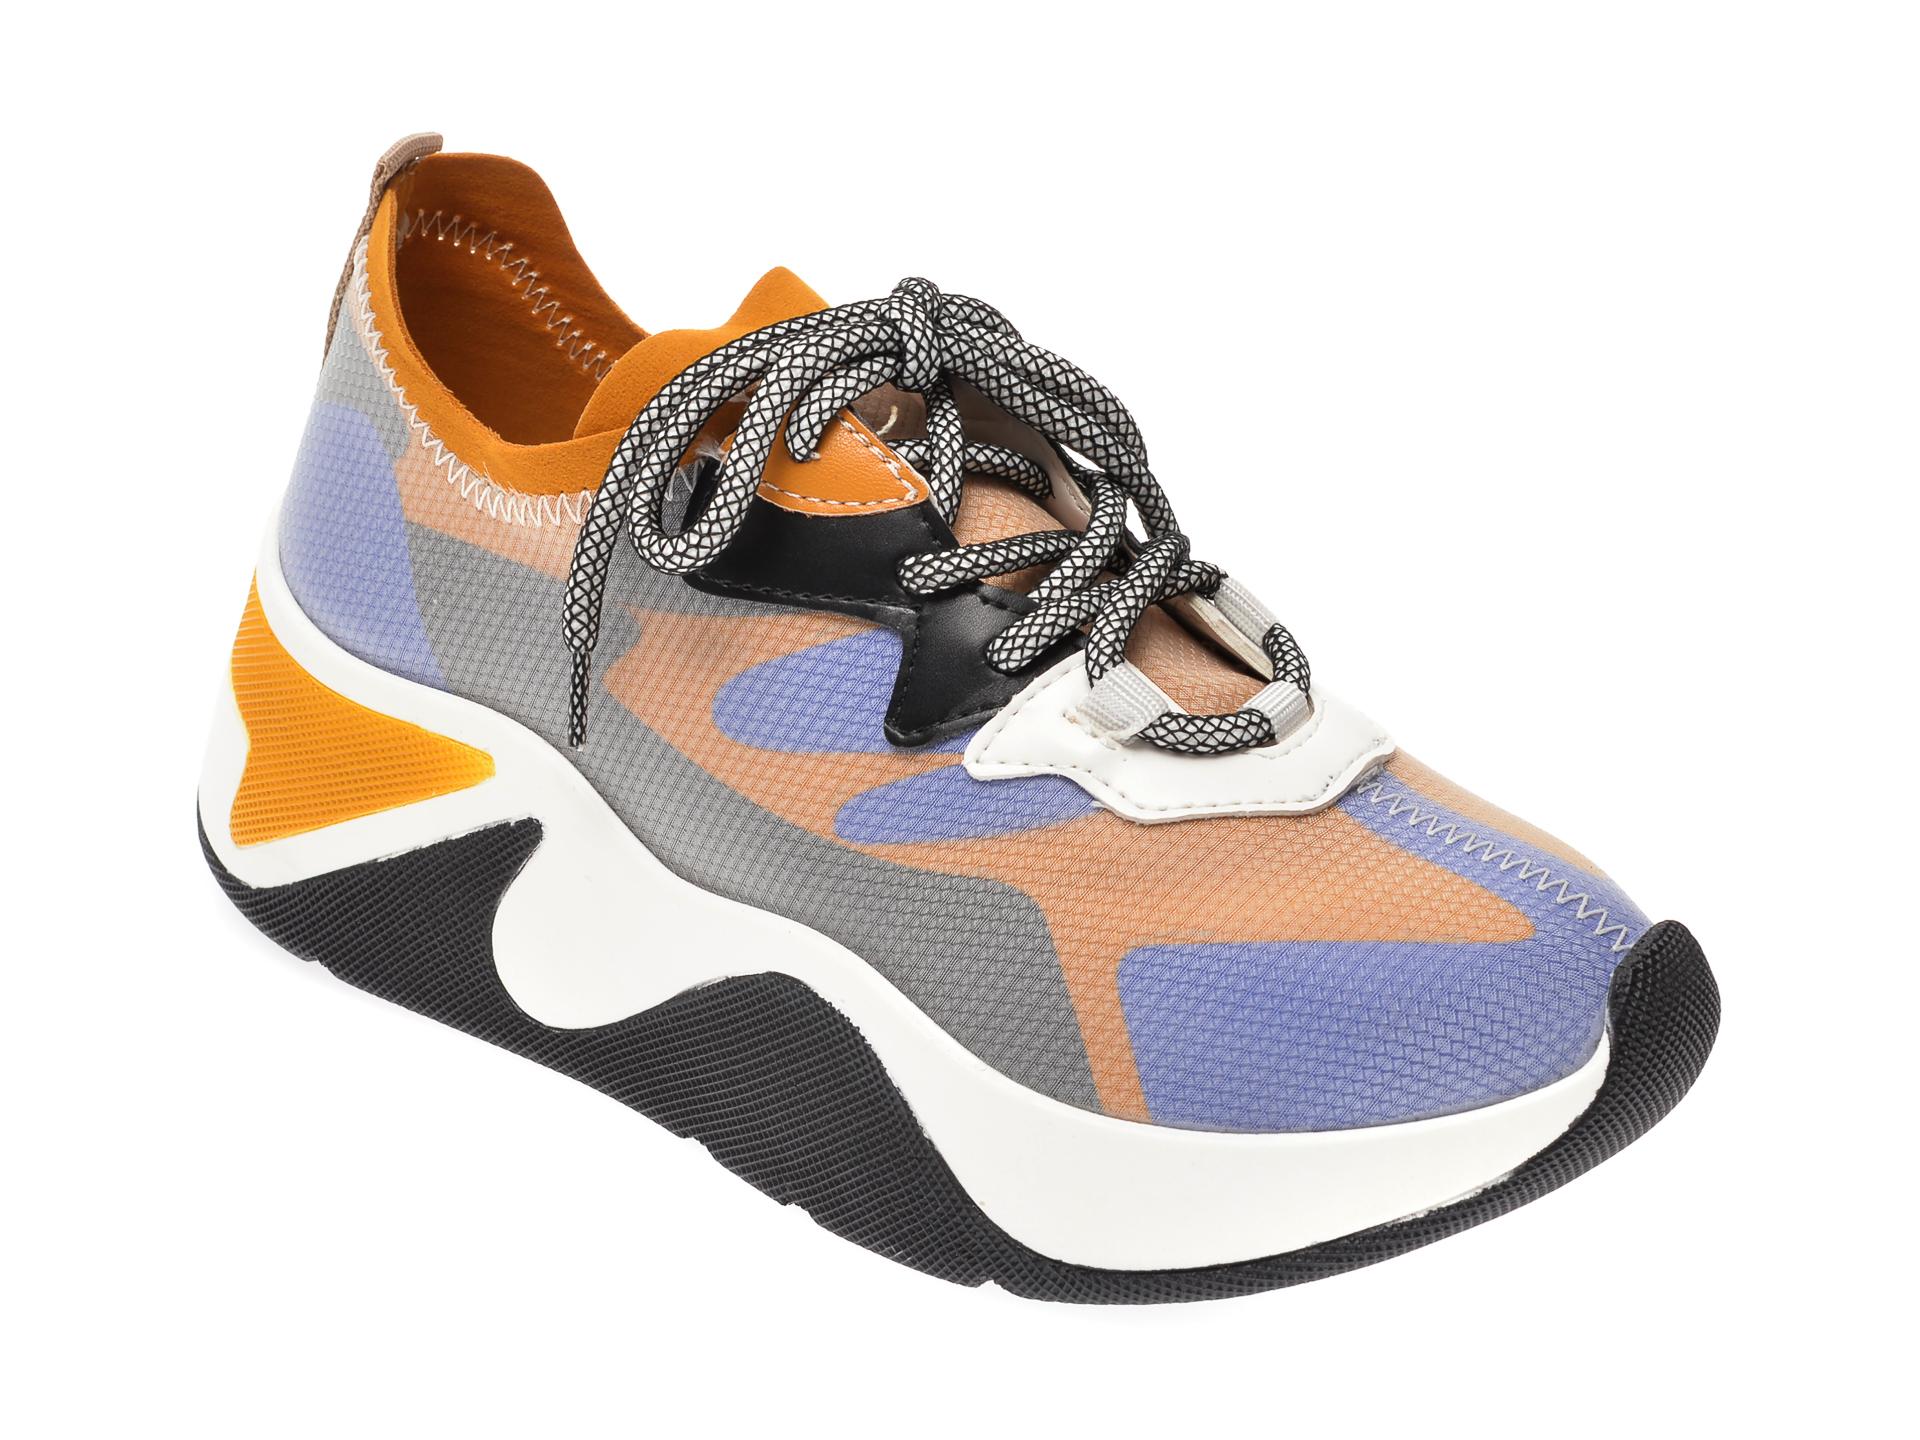 Pantofi sport GRYXX multicolori, MK18, din material textil New